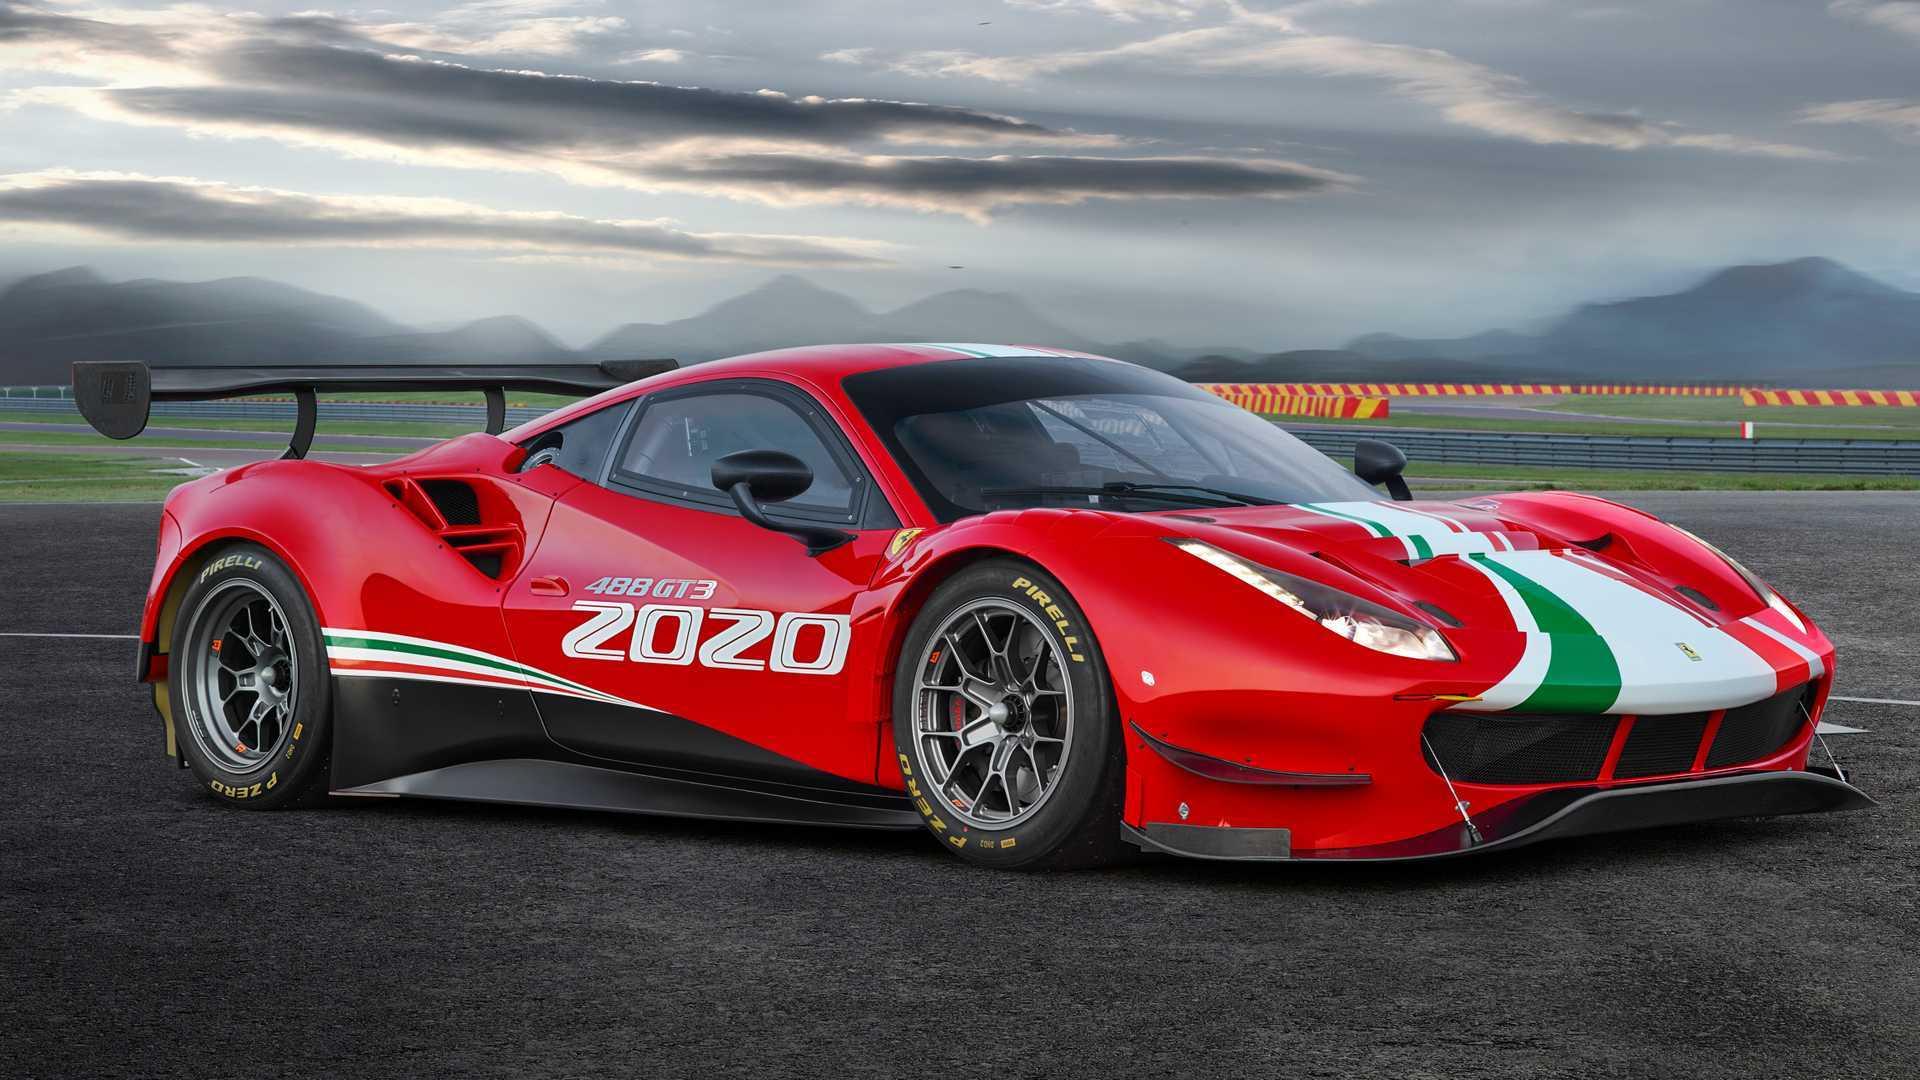 2020 Ferrari 488 GT3 Evo debuts with aero upgrades, longer wheelbase